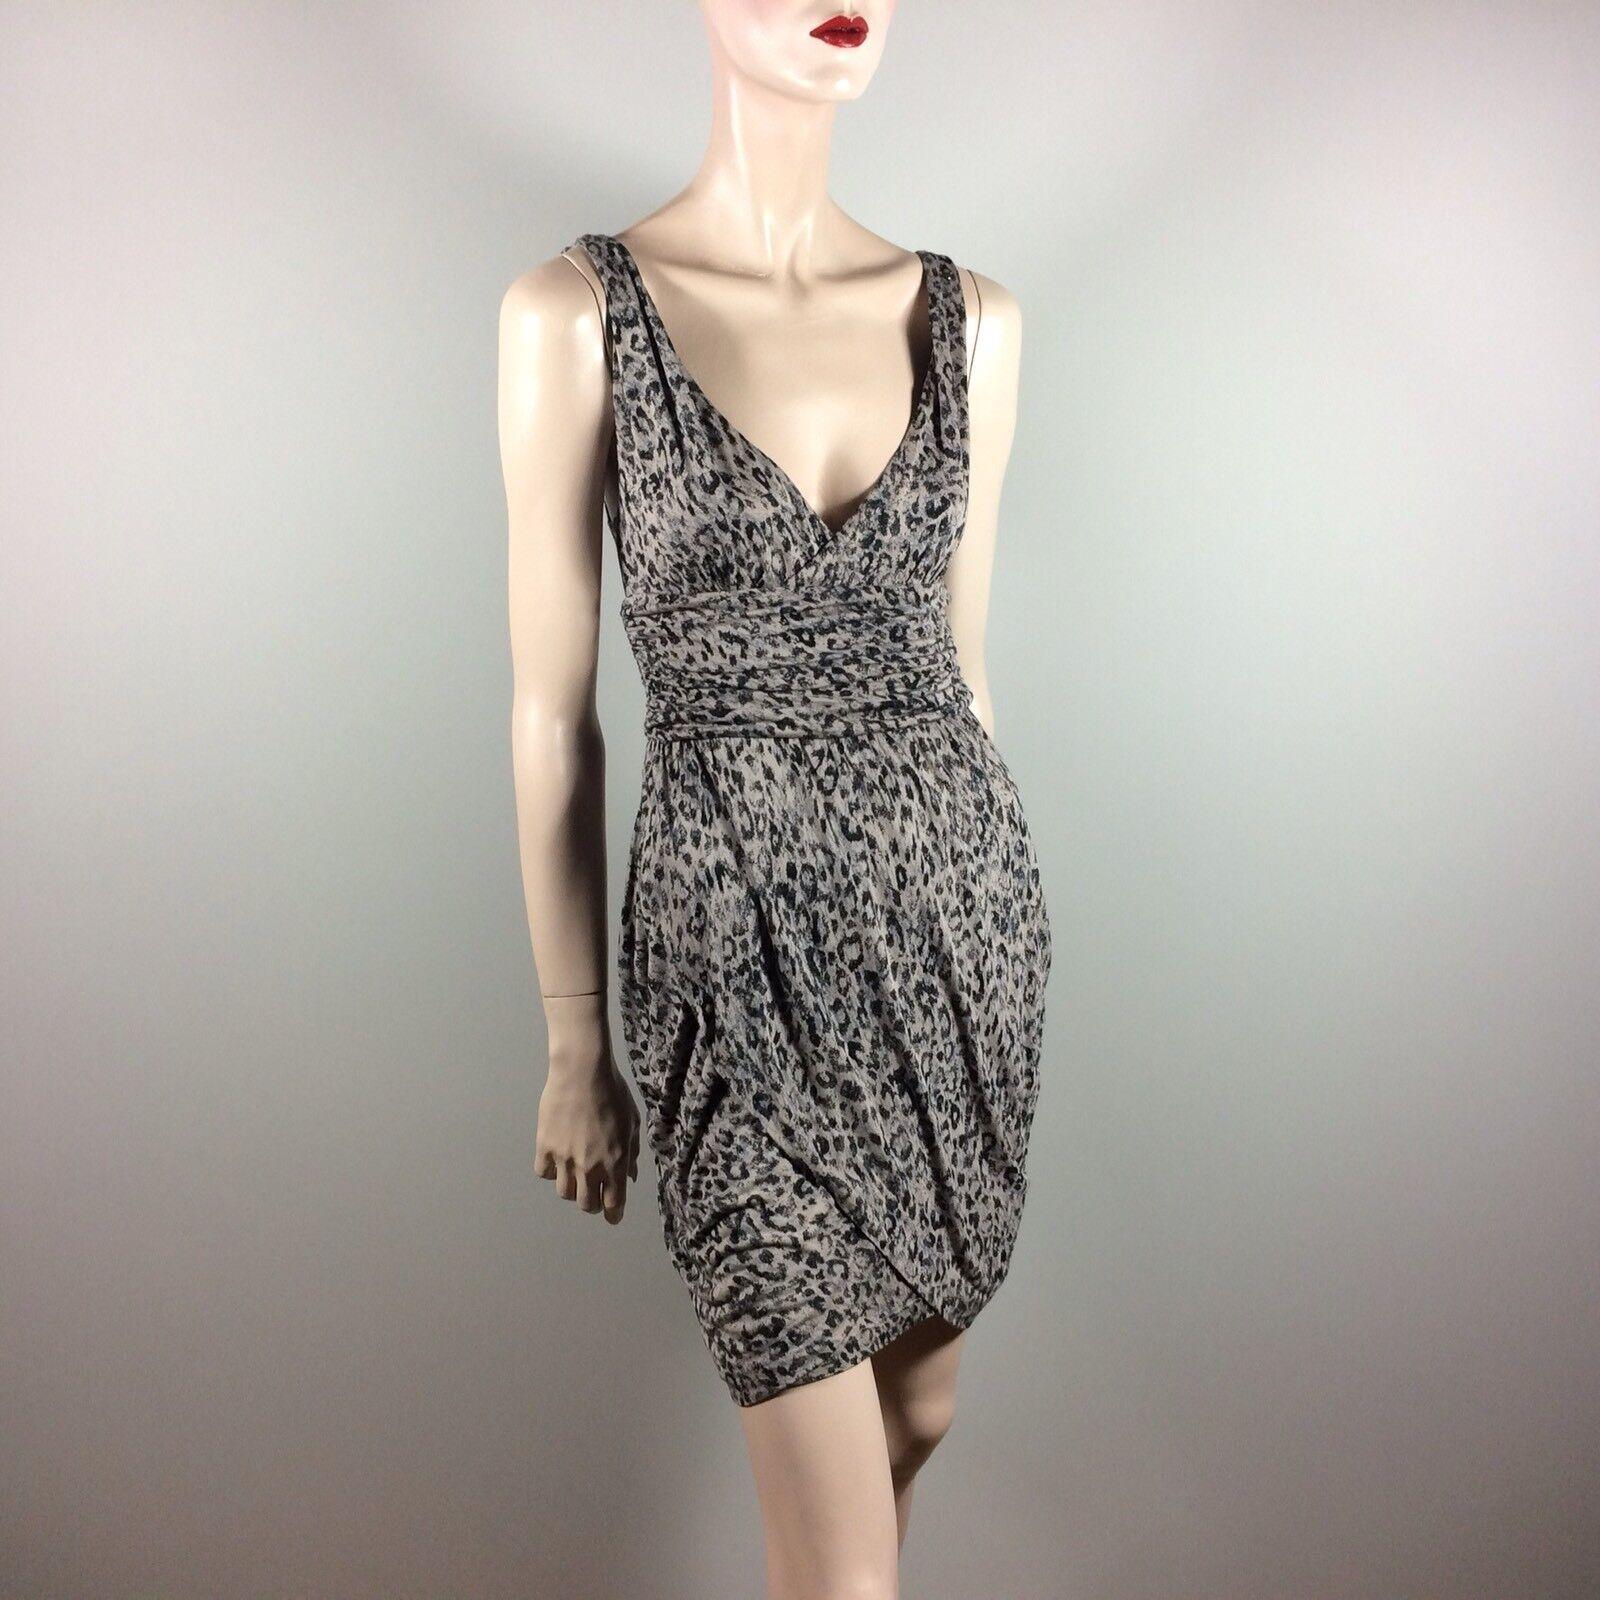 GUESS Los Angeles Donna Donna Donna vestito M 38 GRIGIO Leo ANIMAL print shift dress Diva GLAMOU 10eab2